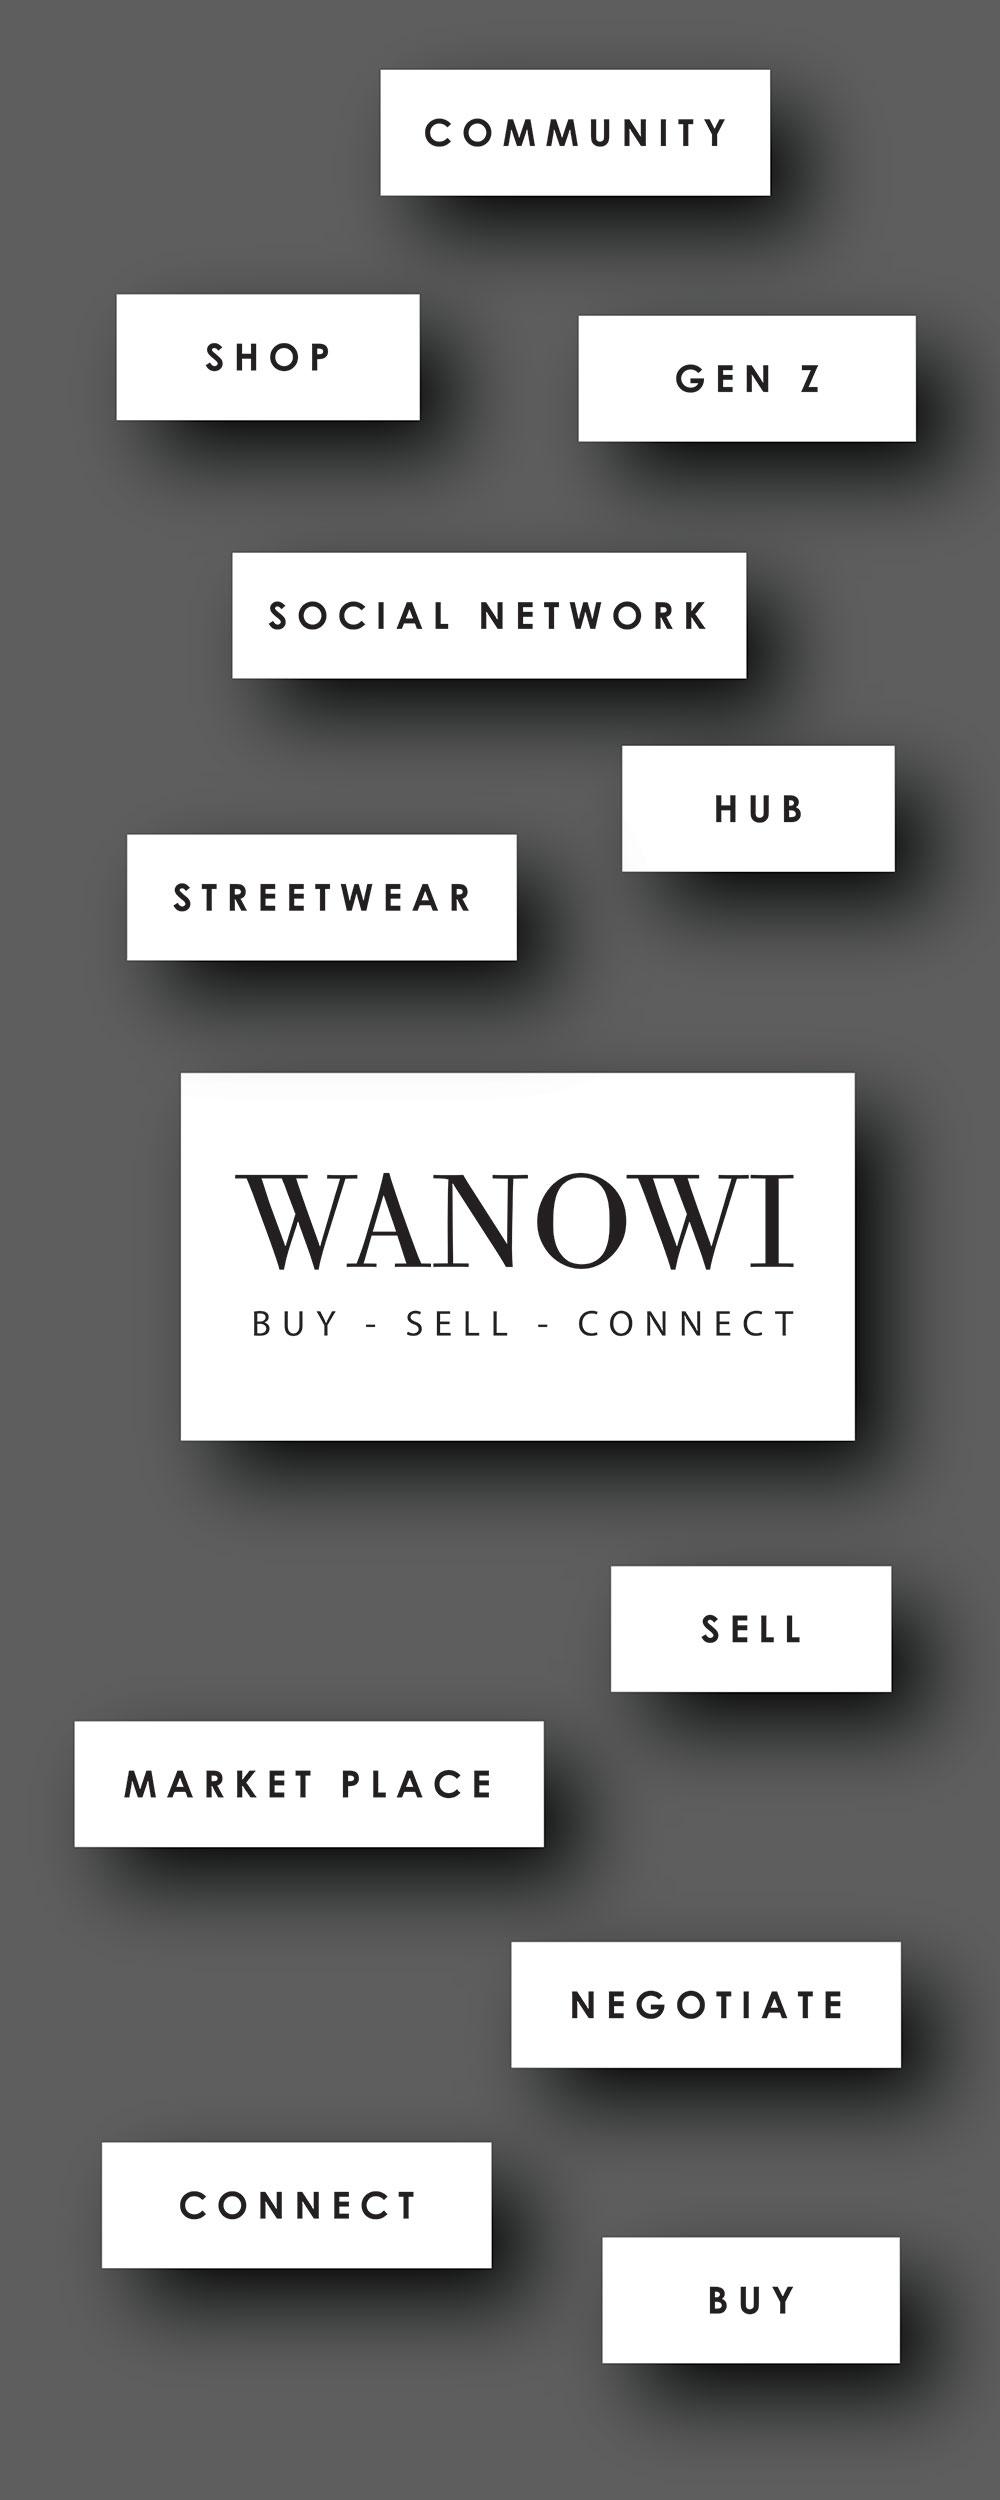 wanowi-instagram-post-1